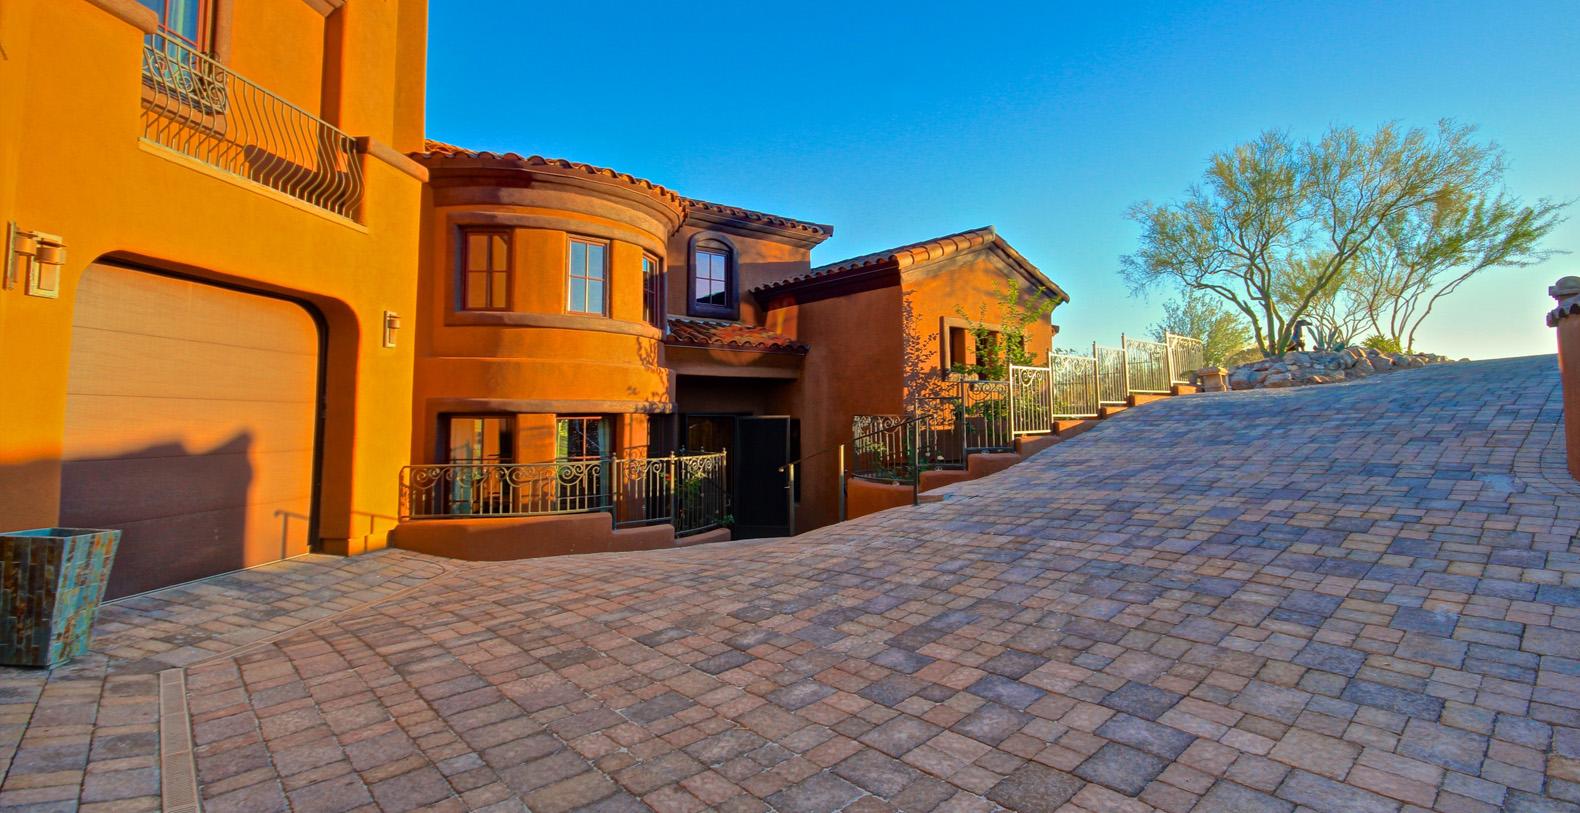 Scottsdale Mansion Arizona Holiday Rental Scottsdale